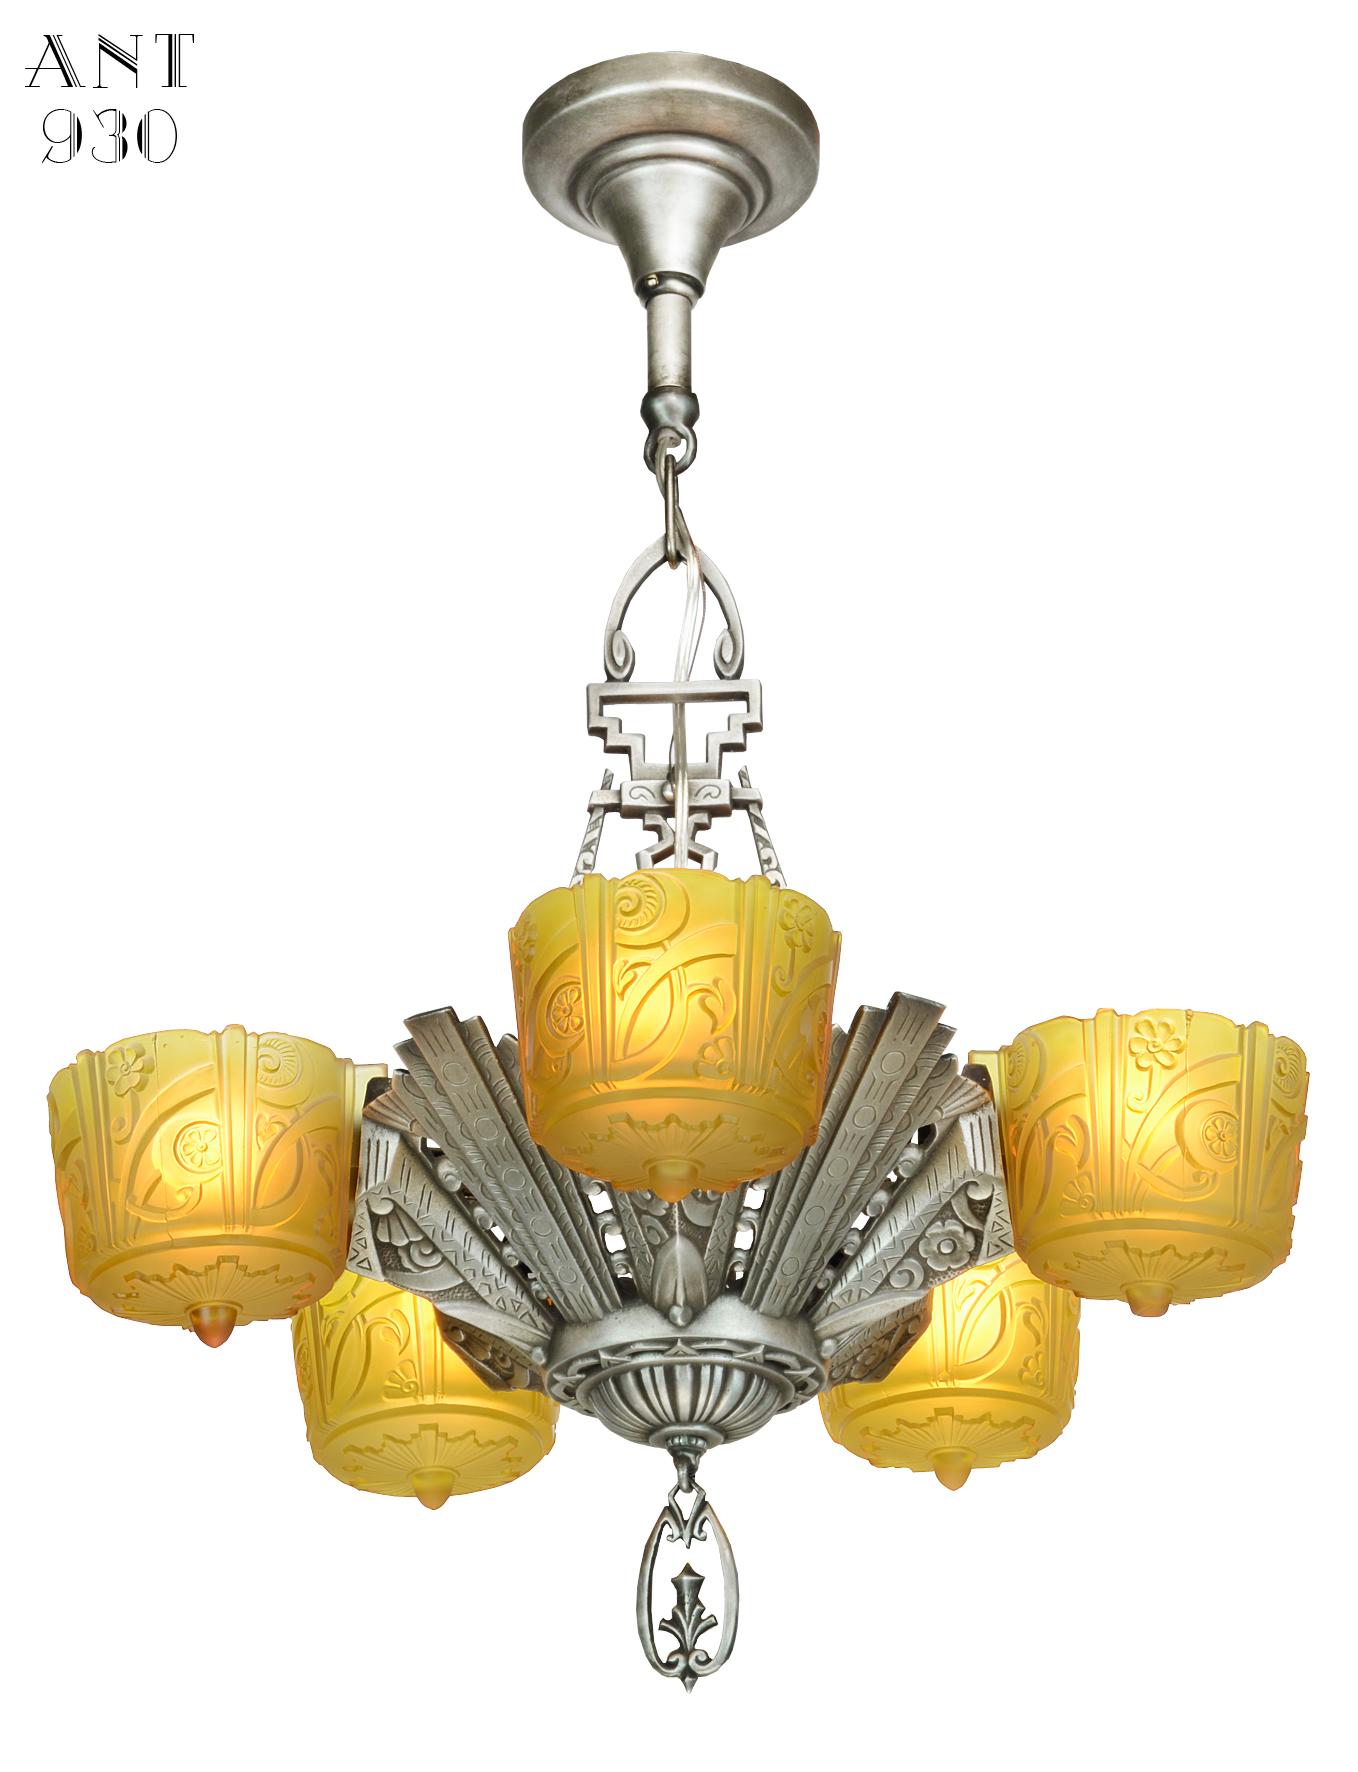 Vintage hardware lighting antique art deco slip shade chandelier mgctlbxnmzp mgctlbxv5111 mgctlbxlc arubaitofo Choice Image